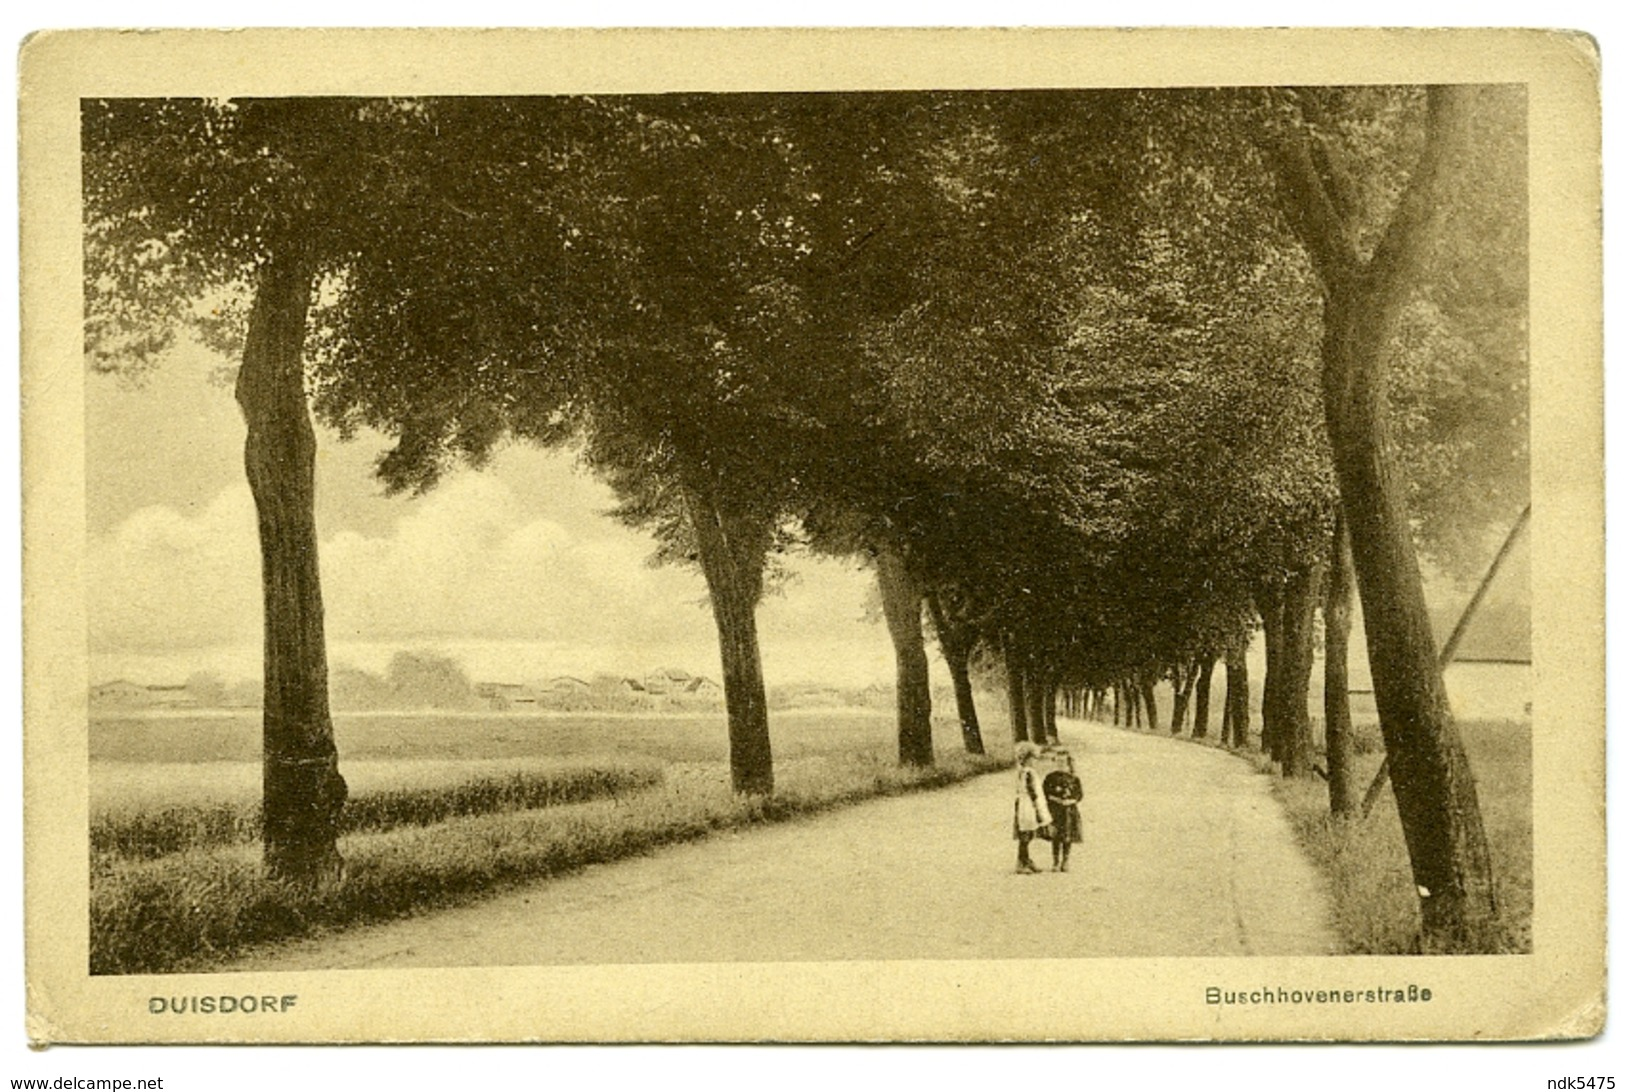 ALLEMAGNE : DUISDORF - BUSCHHOVENERSTRASSE - Bonn